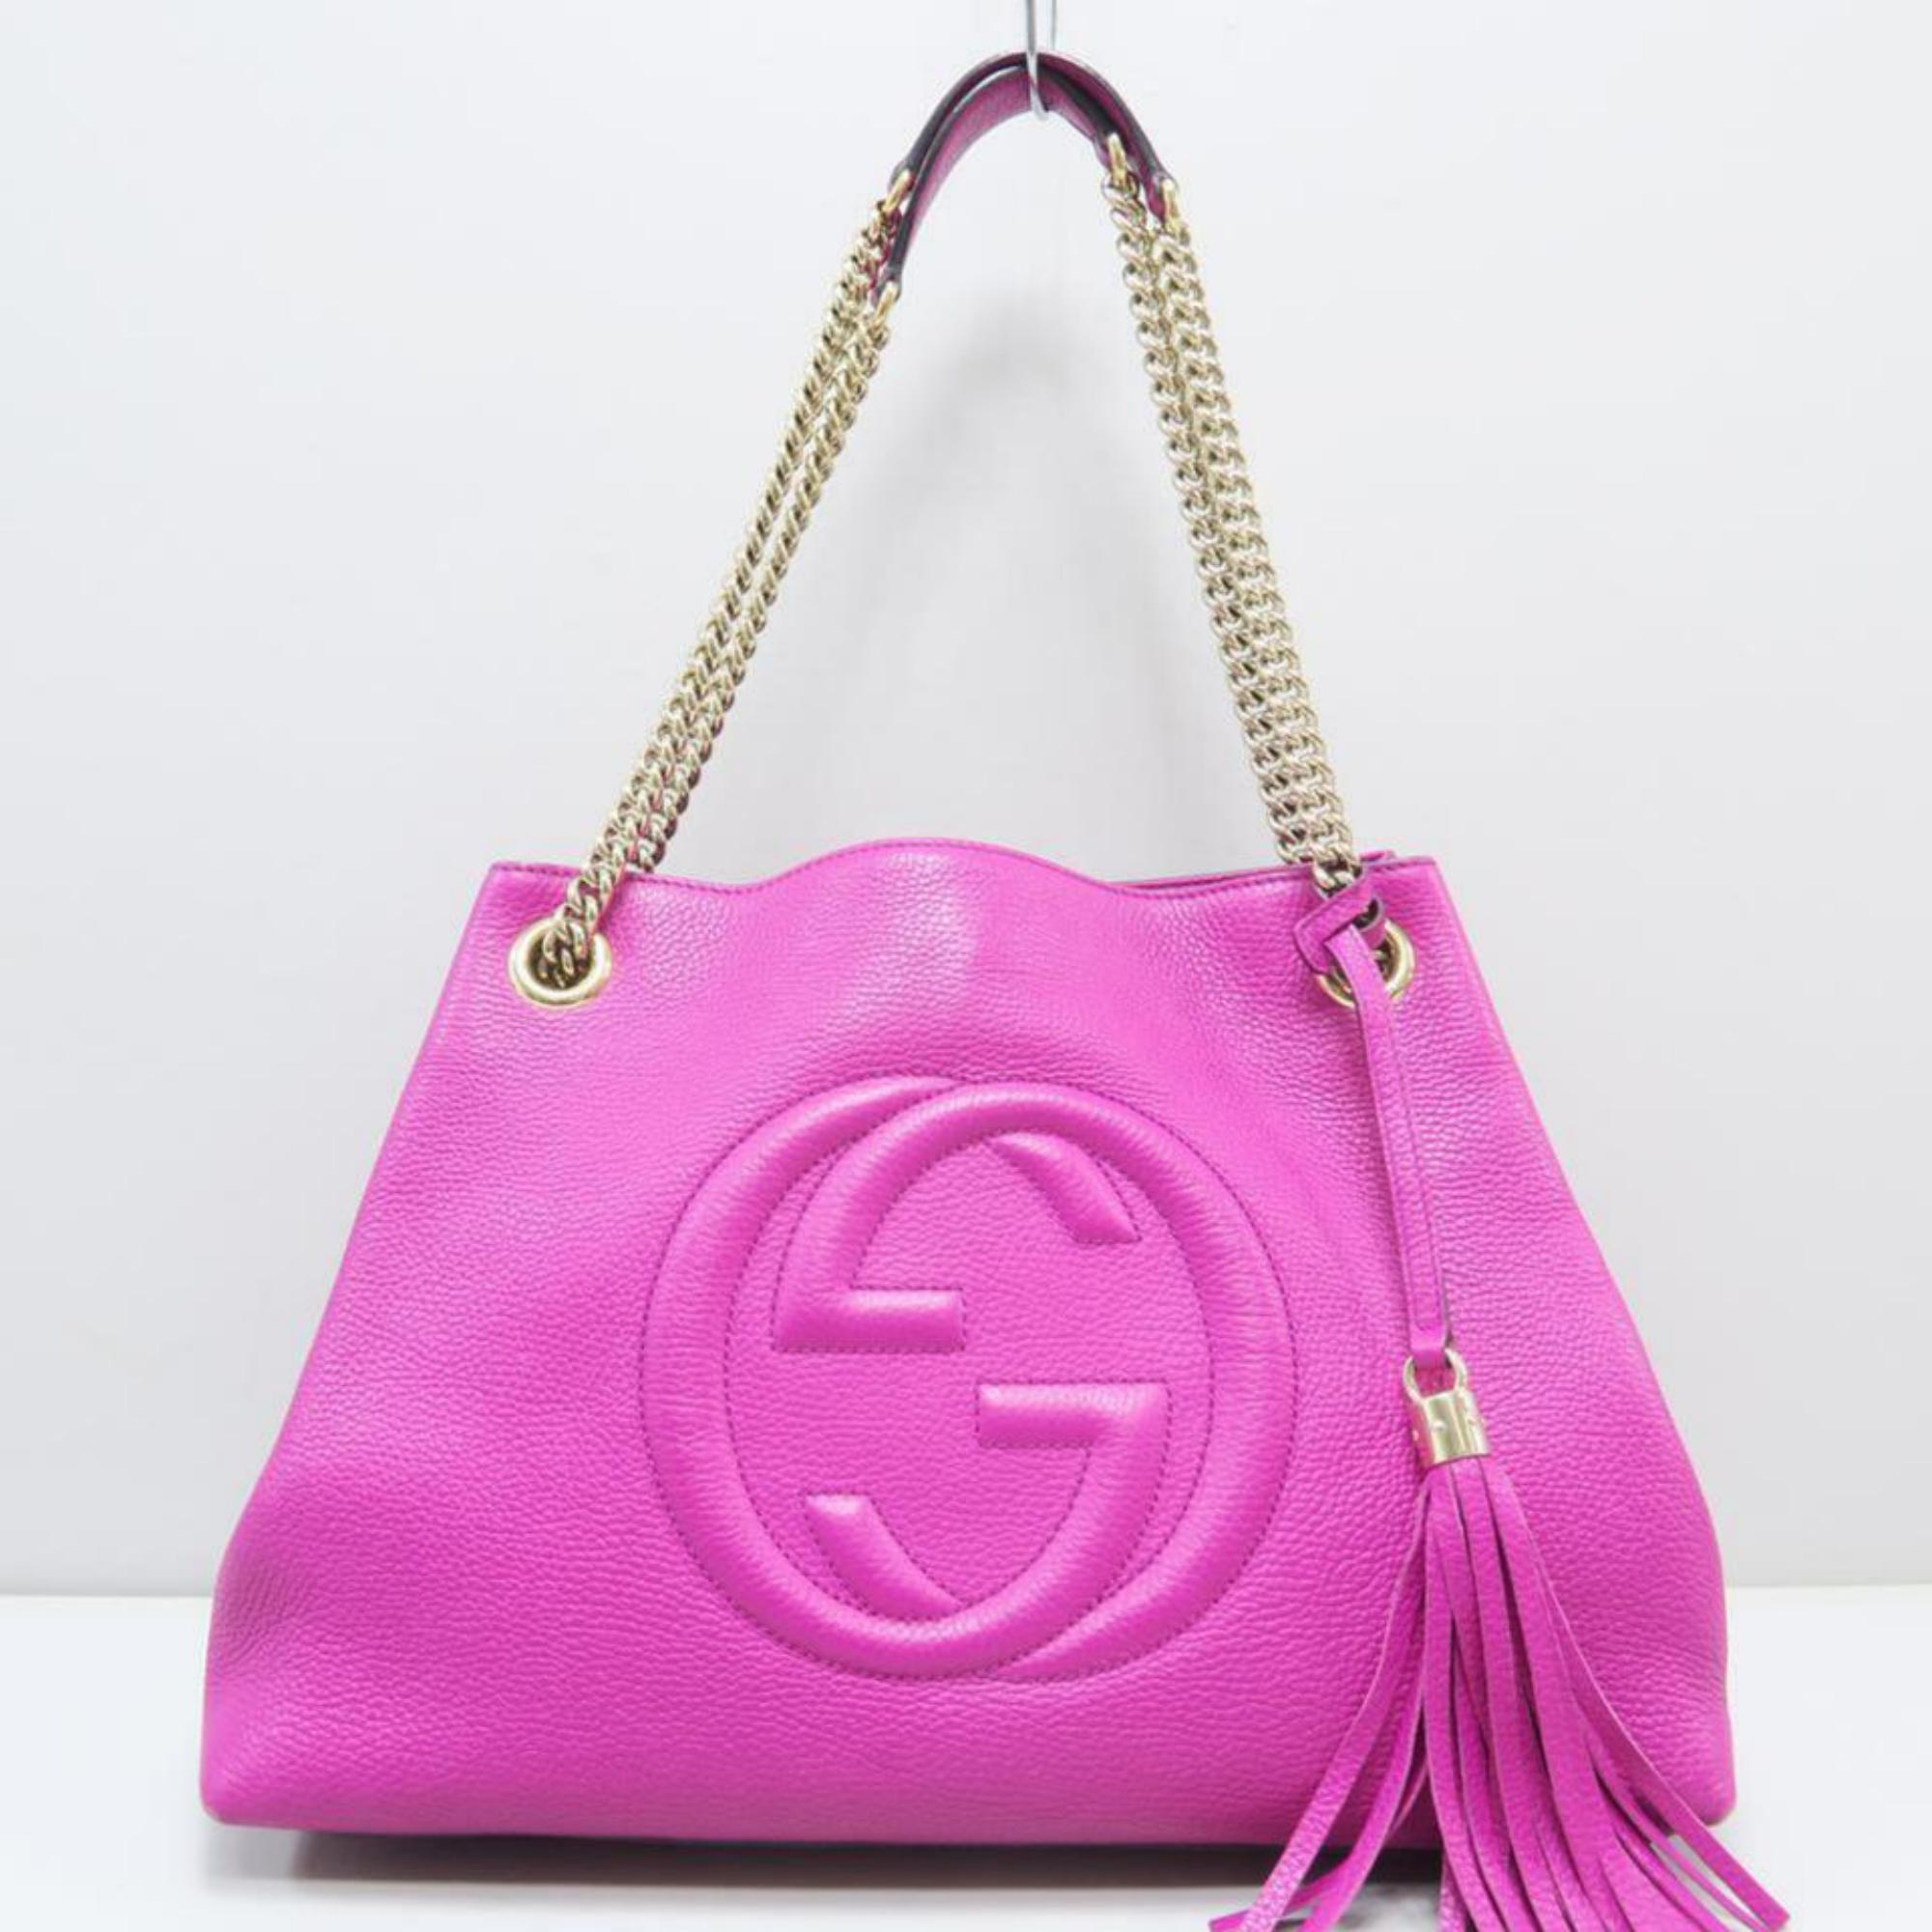 92777d6d2afb89 Gucci Soho Fringe Tassel Fuchsia Chain Tote 869084 Pink Leather Shoulder Bag  at 1stdibs